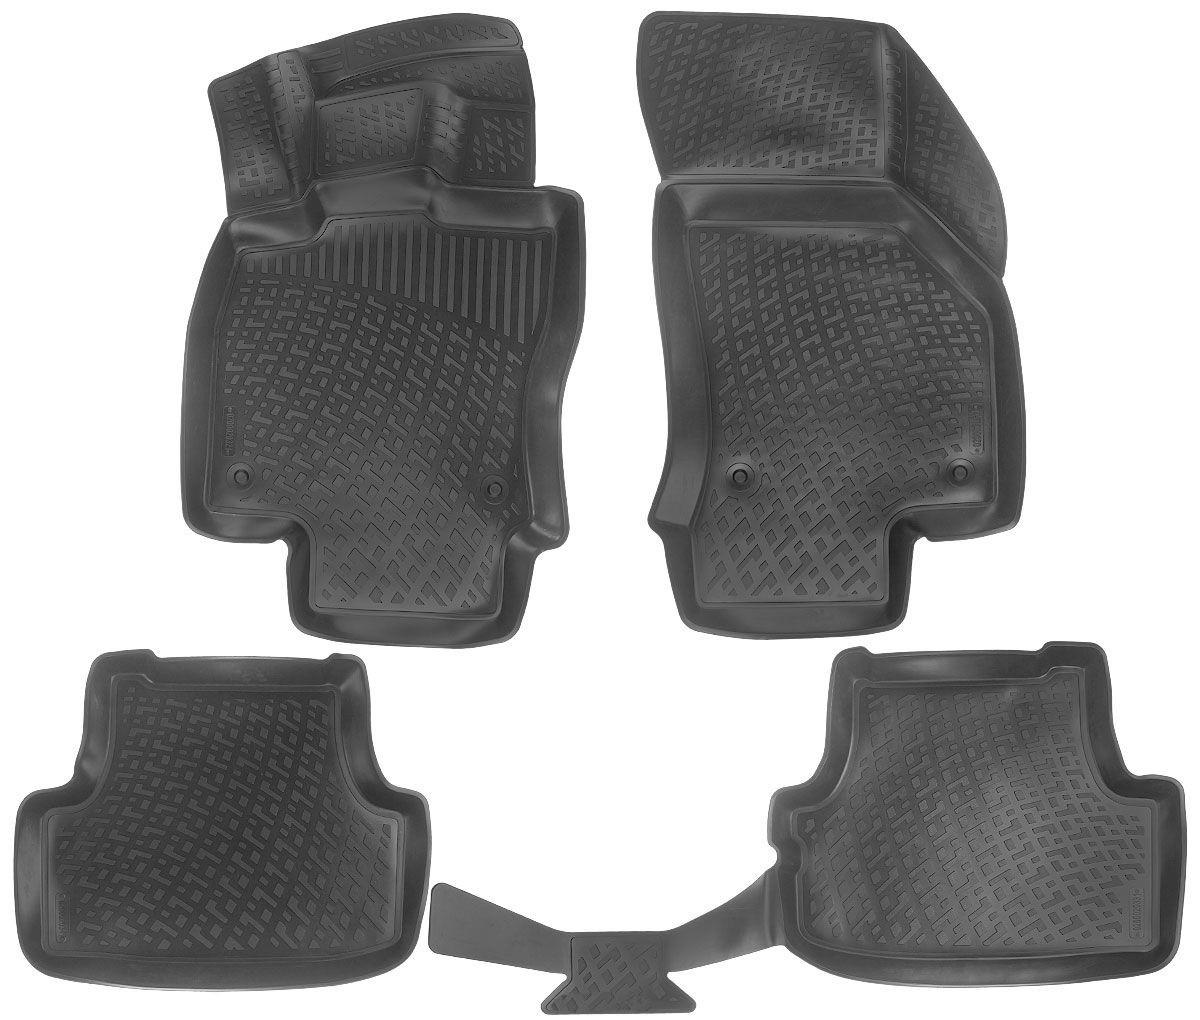 Коврики в салон для Audi A3 (8V) Sport Bac (12-) полиуретановые 200020301